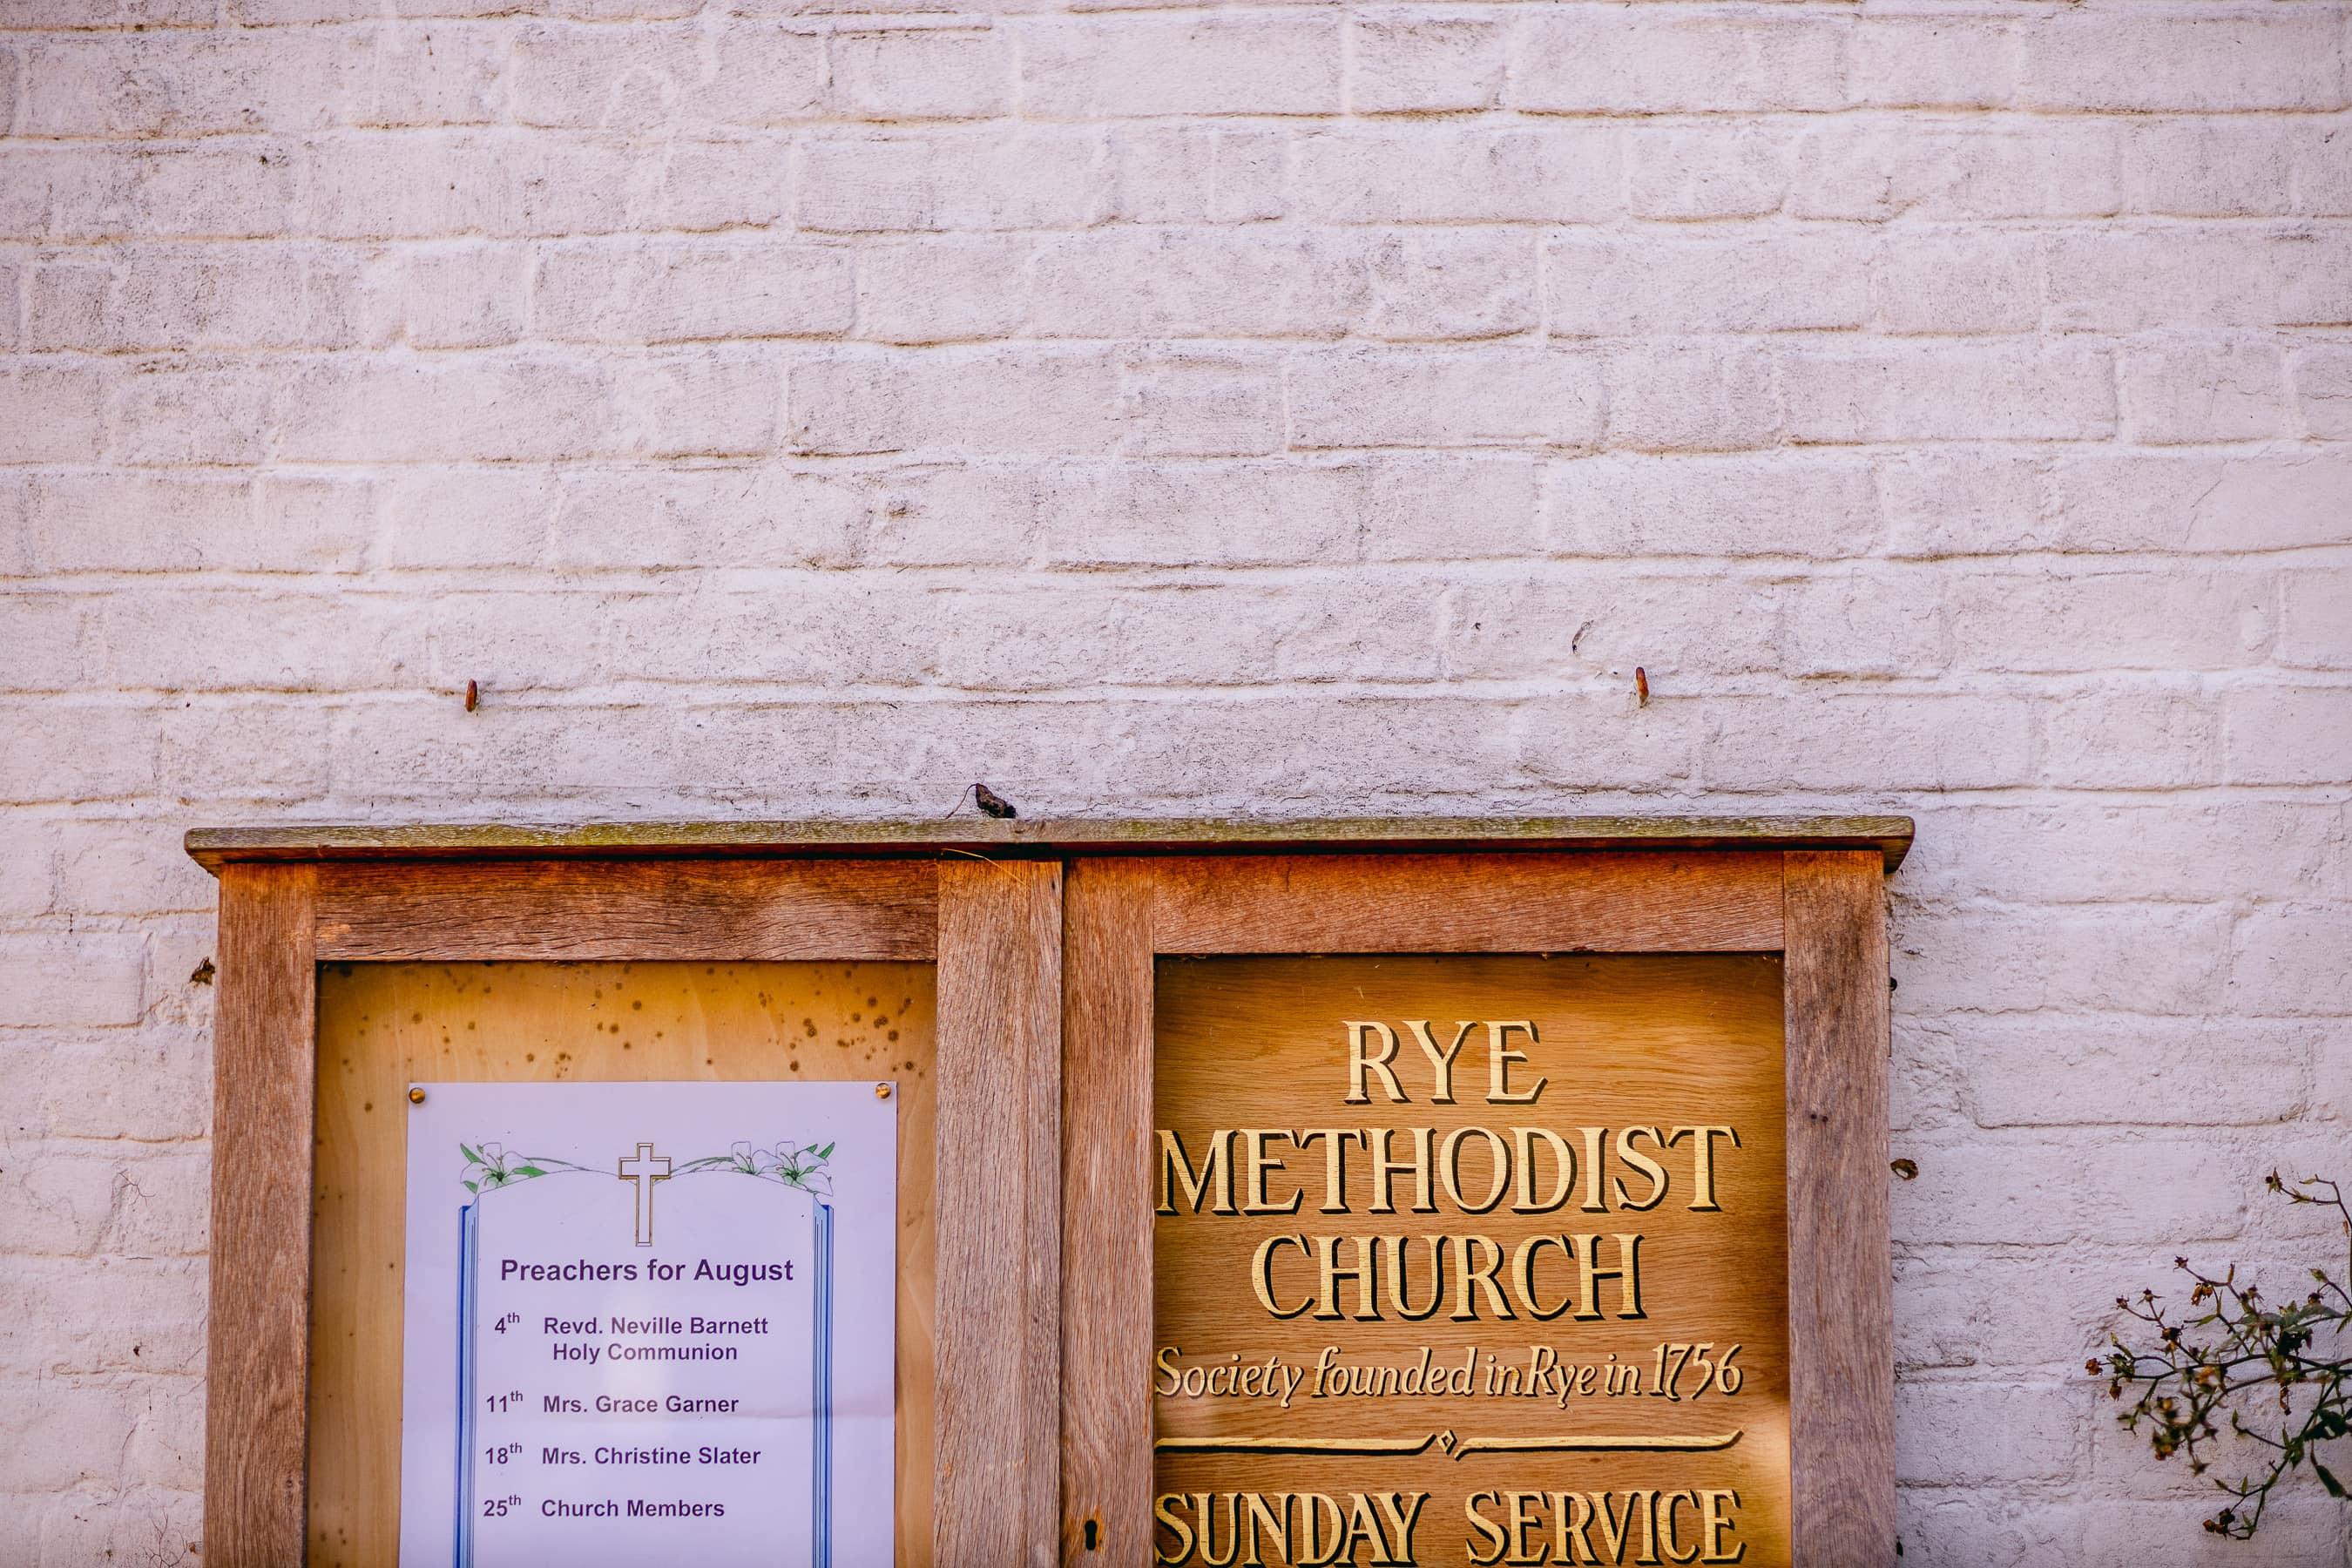 Rye Methodist Church